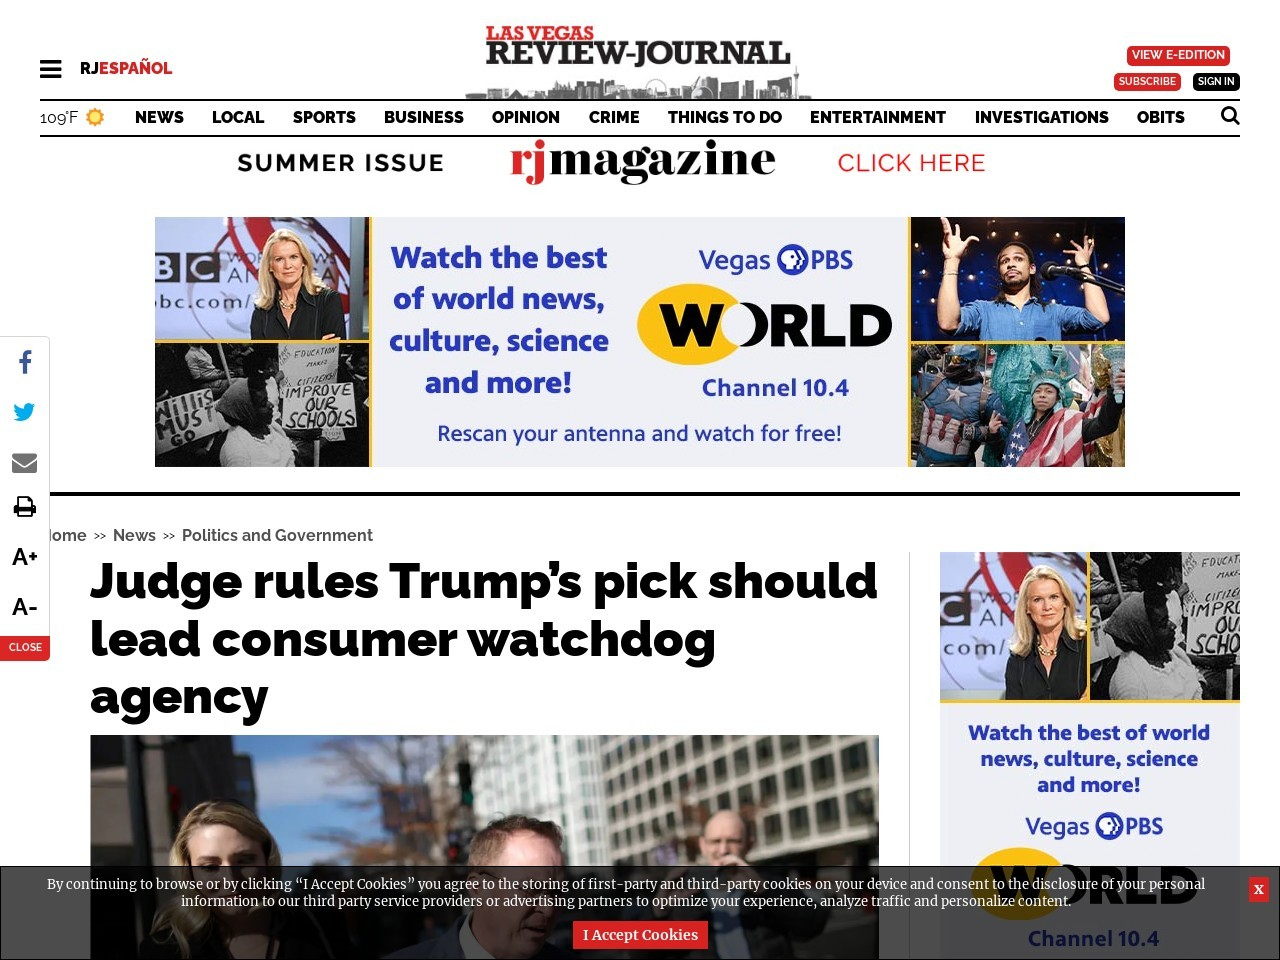 Judge rules Trump's pick should lead consumer watchdog agency